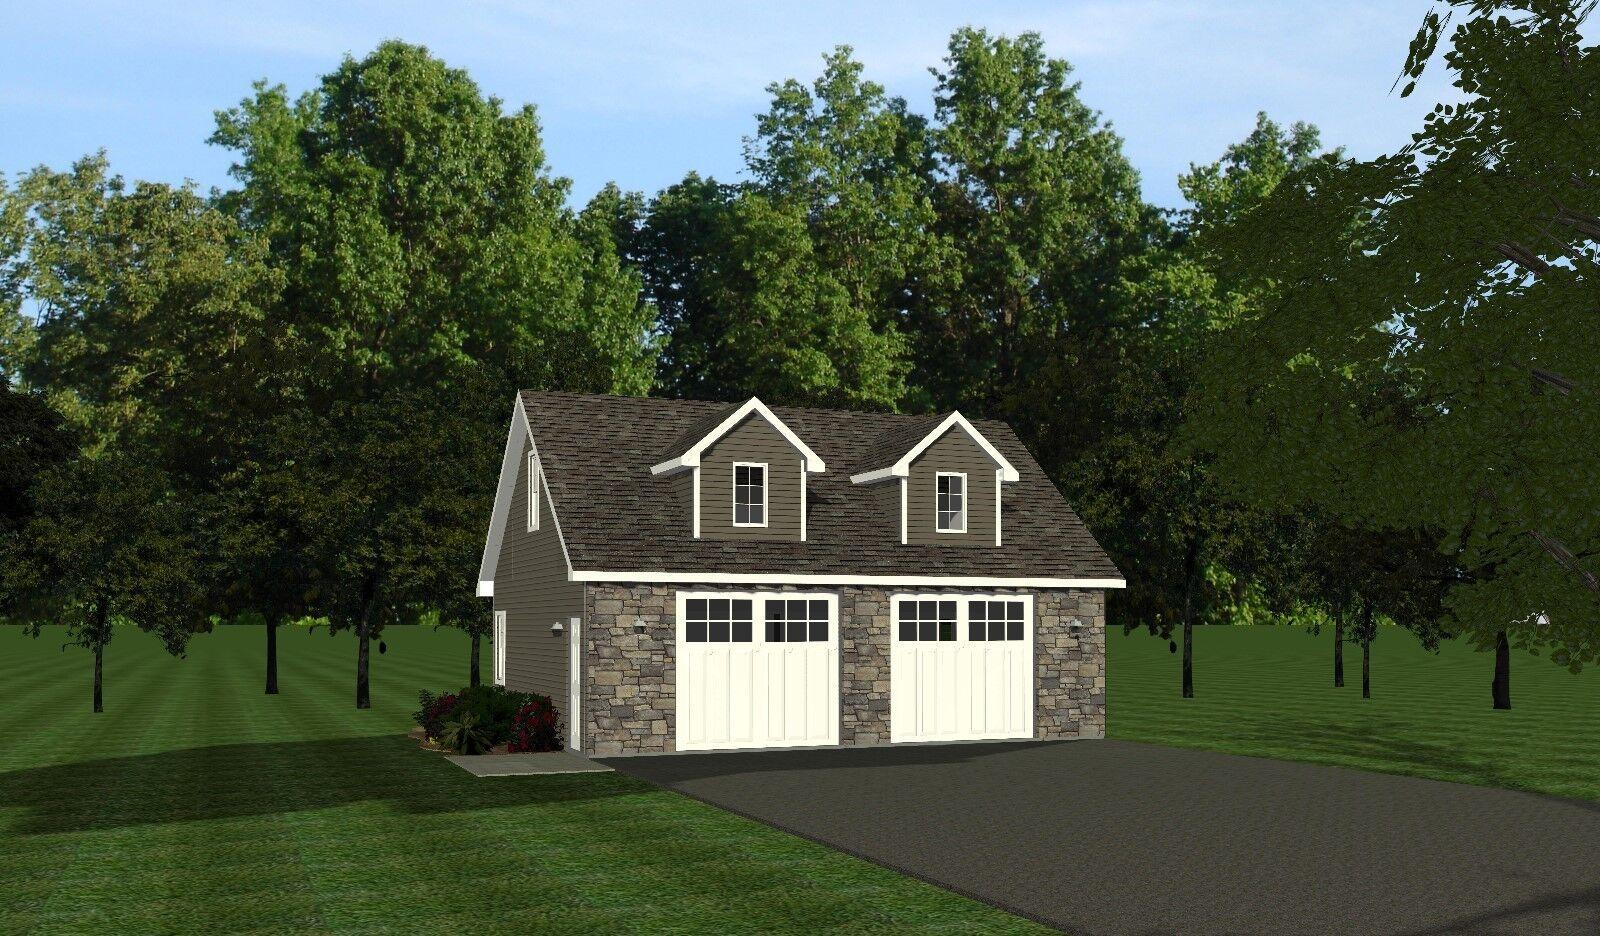 2-car garage plans 30x24 w/ Loft plan 720 720 720 sf  1032 44a376